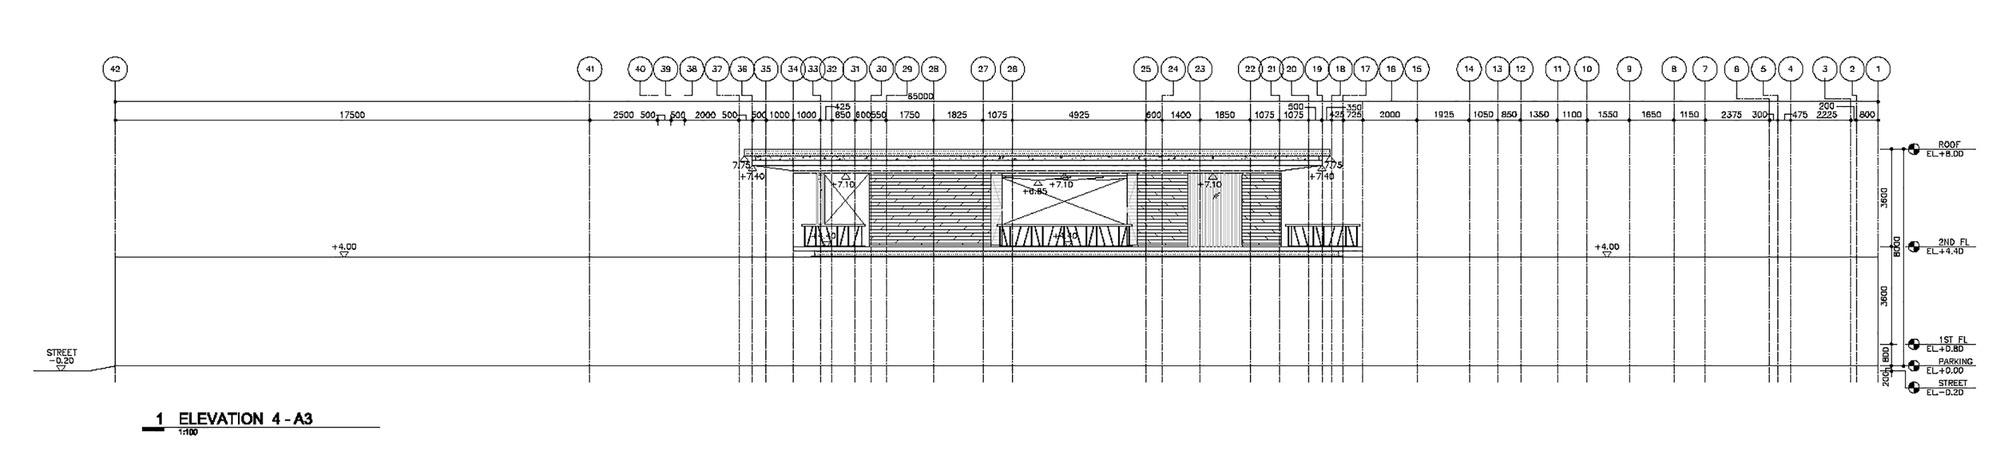 Stylish Tropical Paradise Theme of Lemongrass Restaurant Designed by Einstein & Associates-25